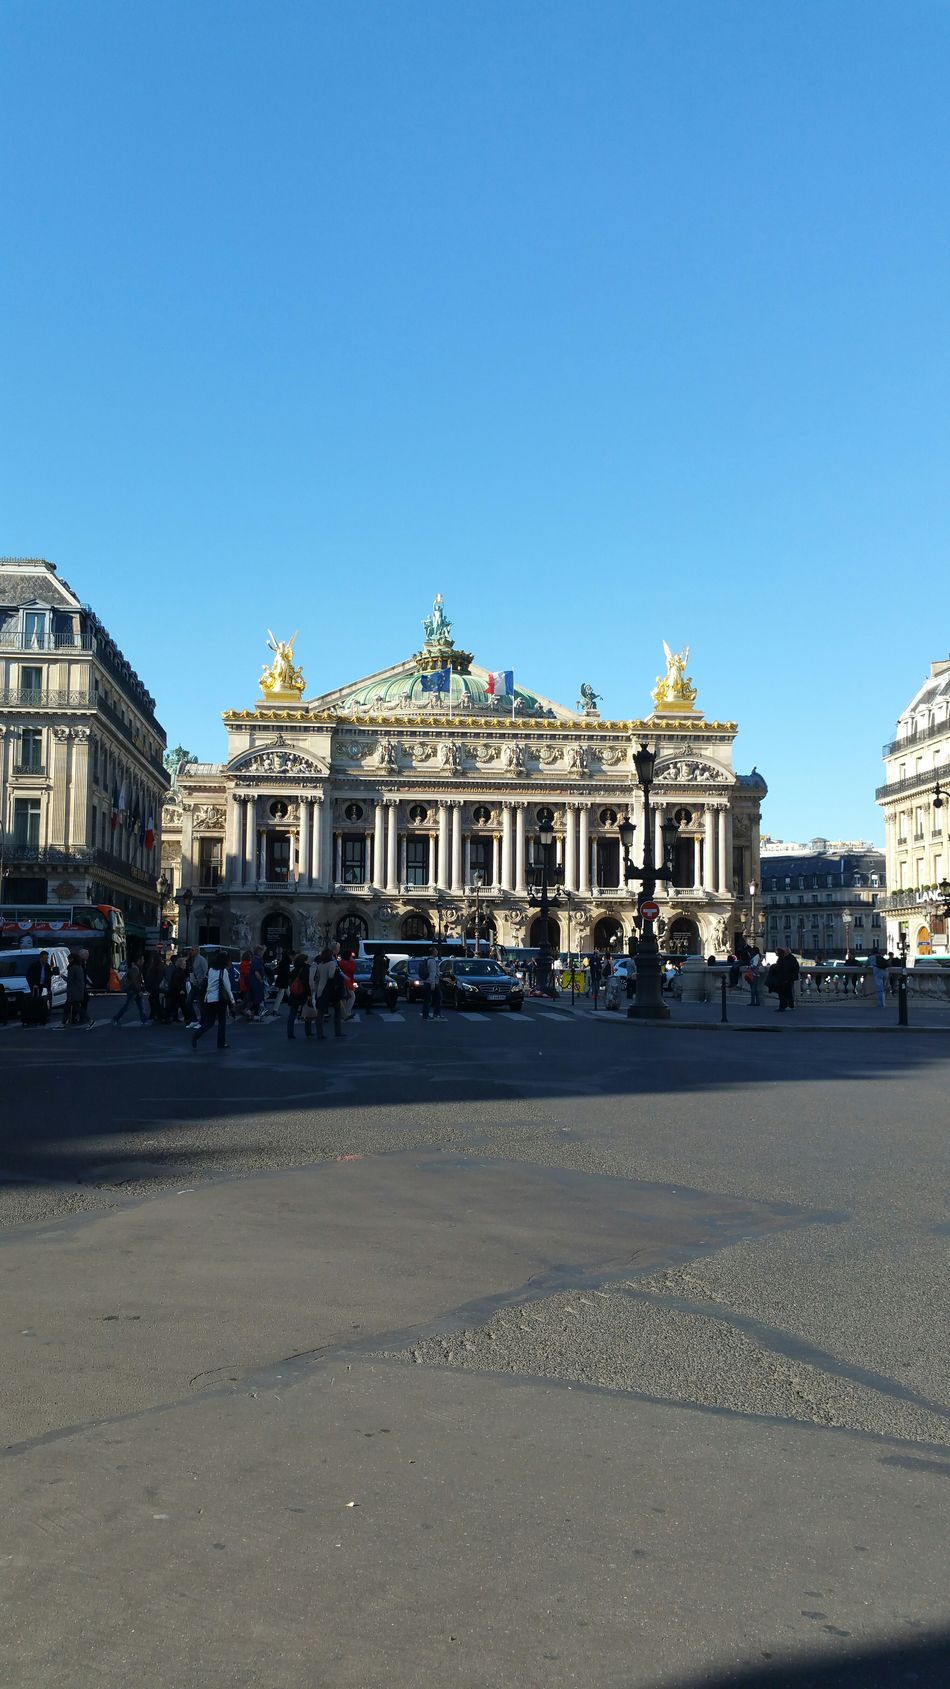 Paris, Opéra Garnier Paris, France  Paris Opera Garnier Place De L'opéra Travel World Traveler Parisian Opera National De Paris Palais Garnier